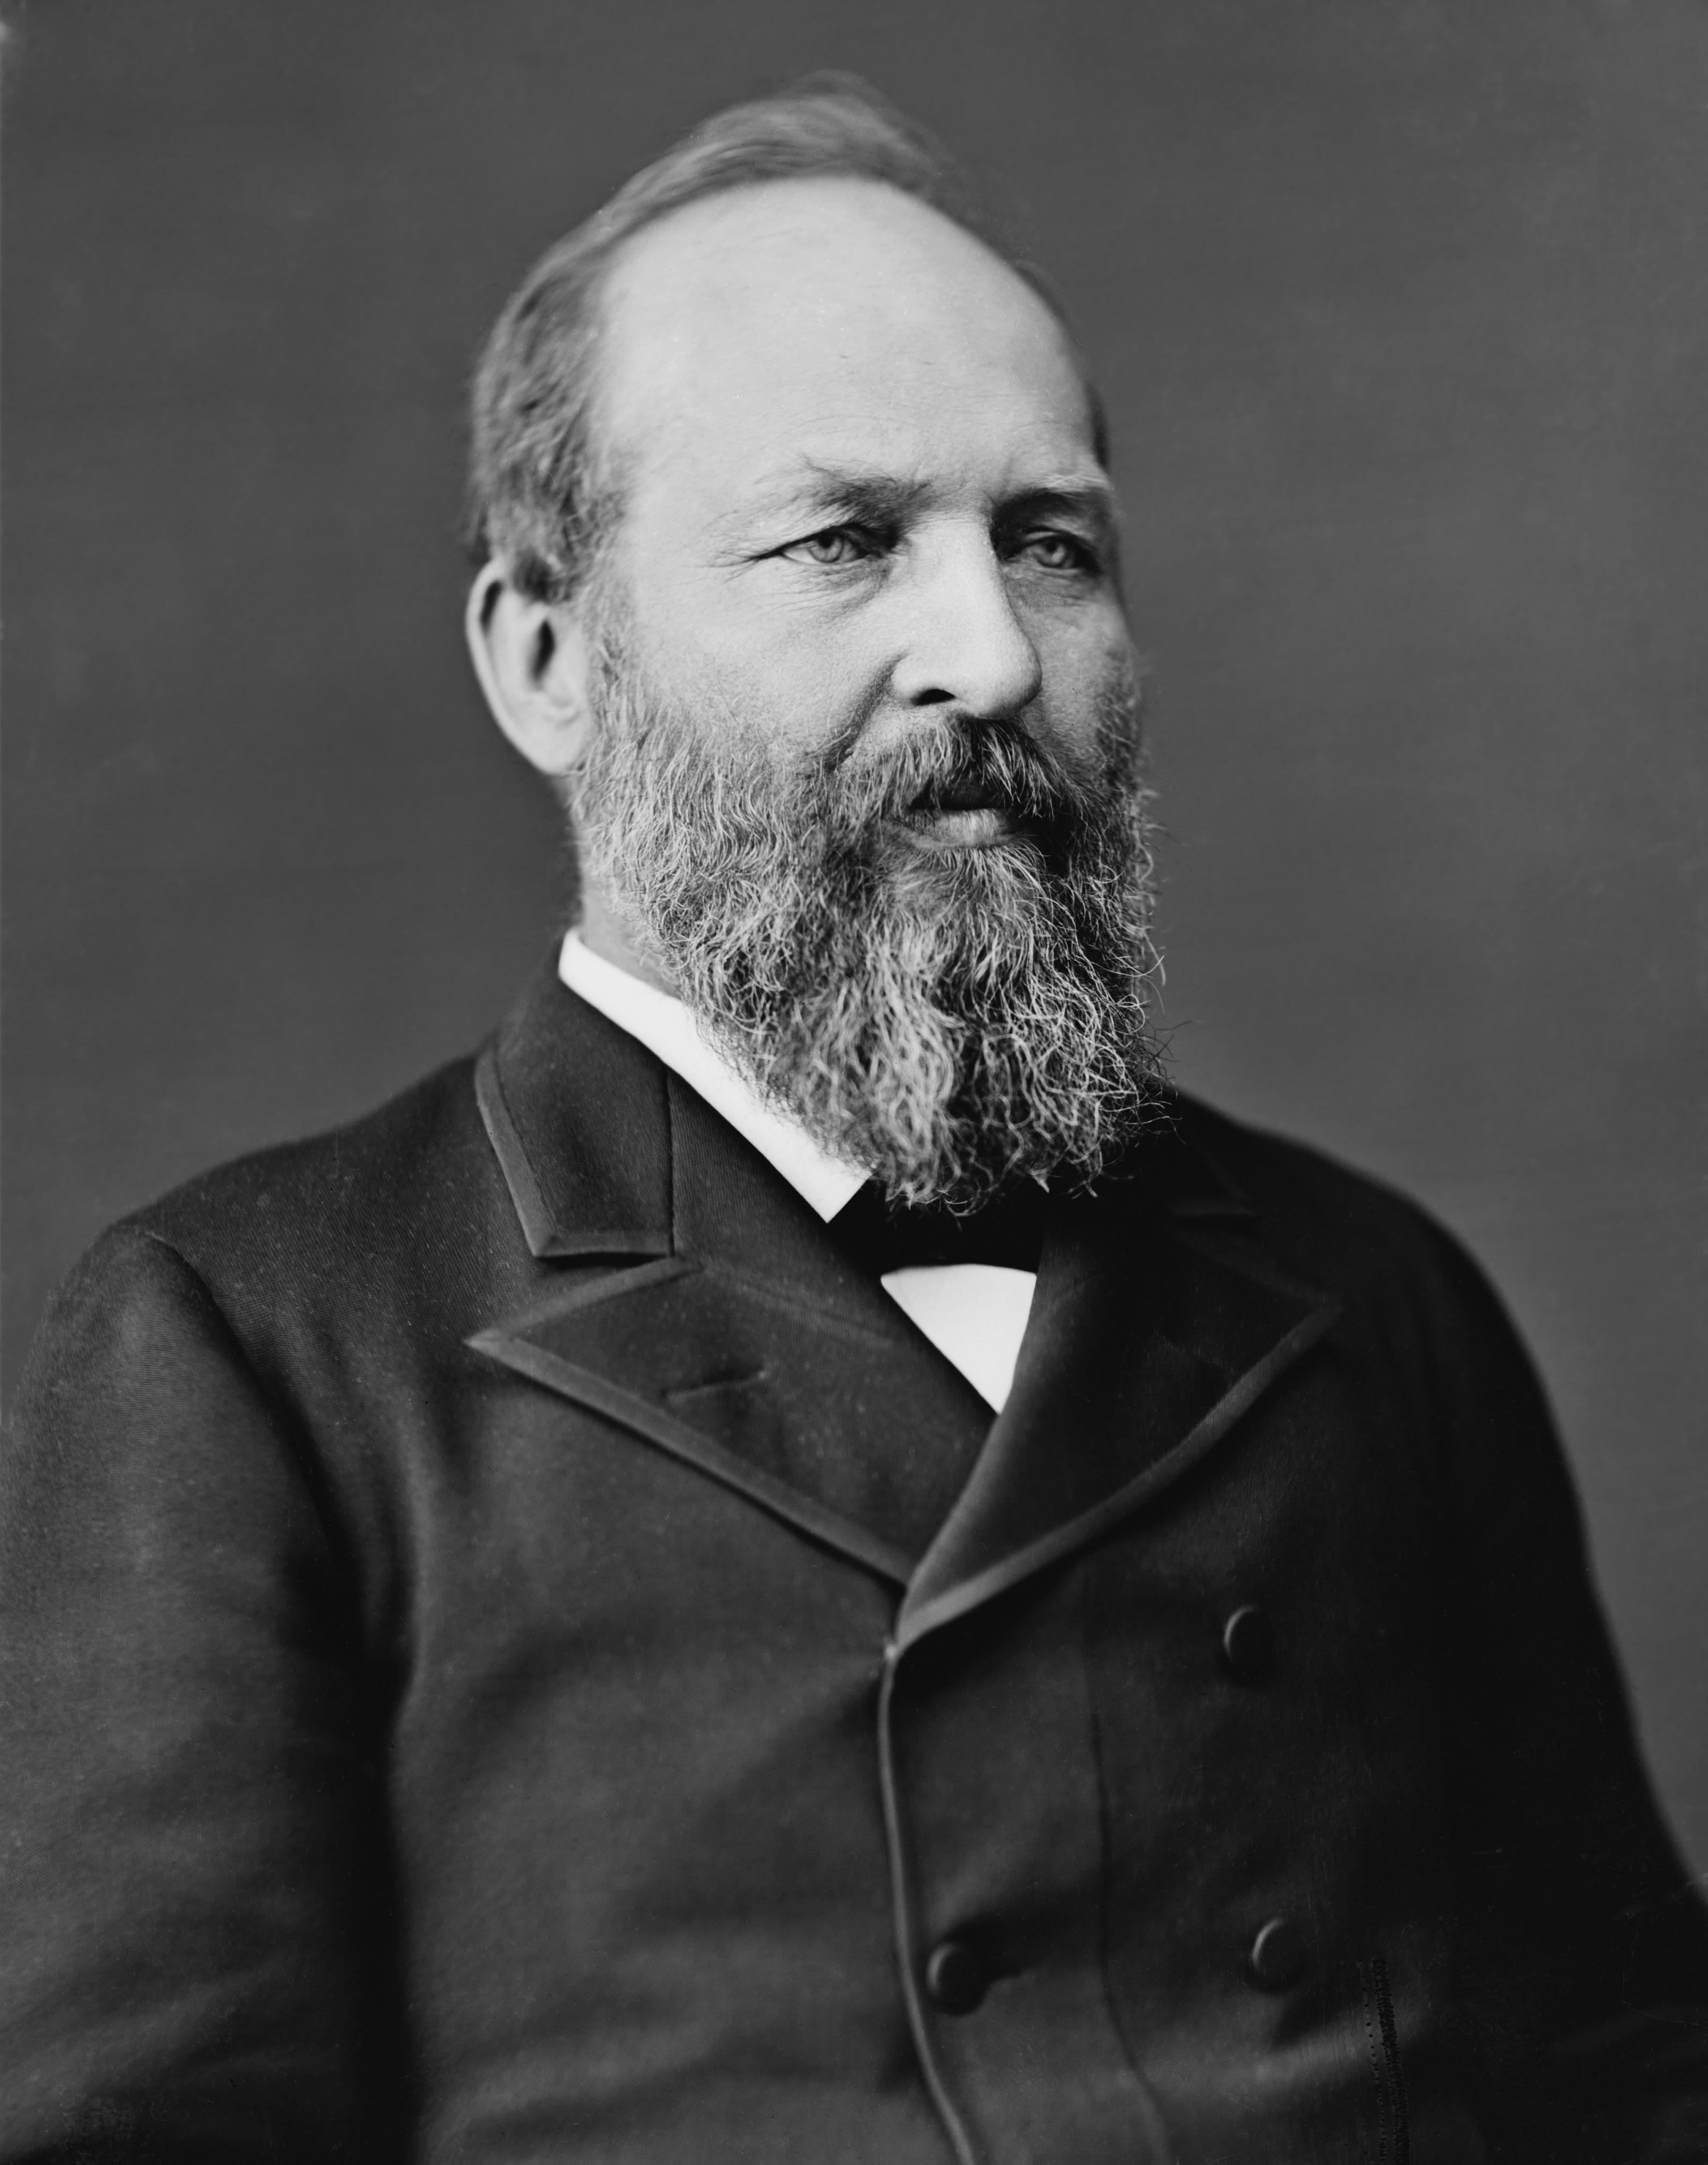 James A. Garfield photo